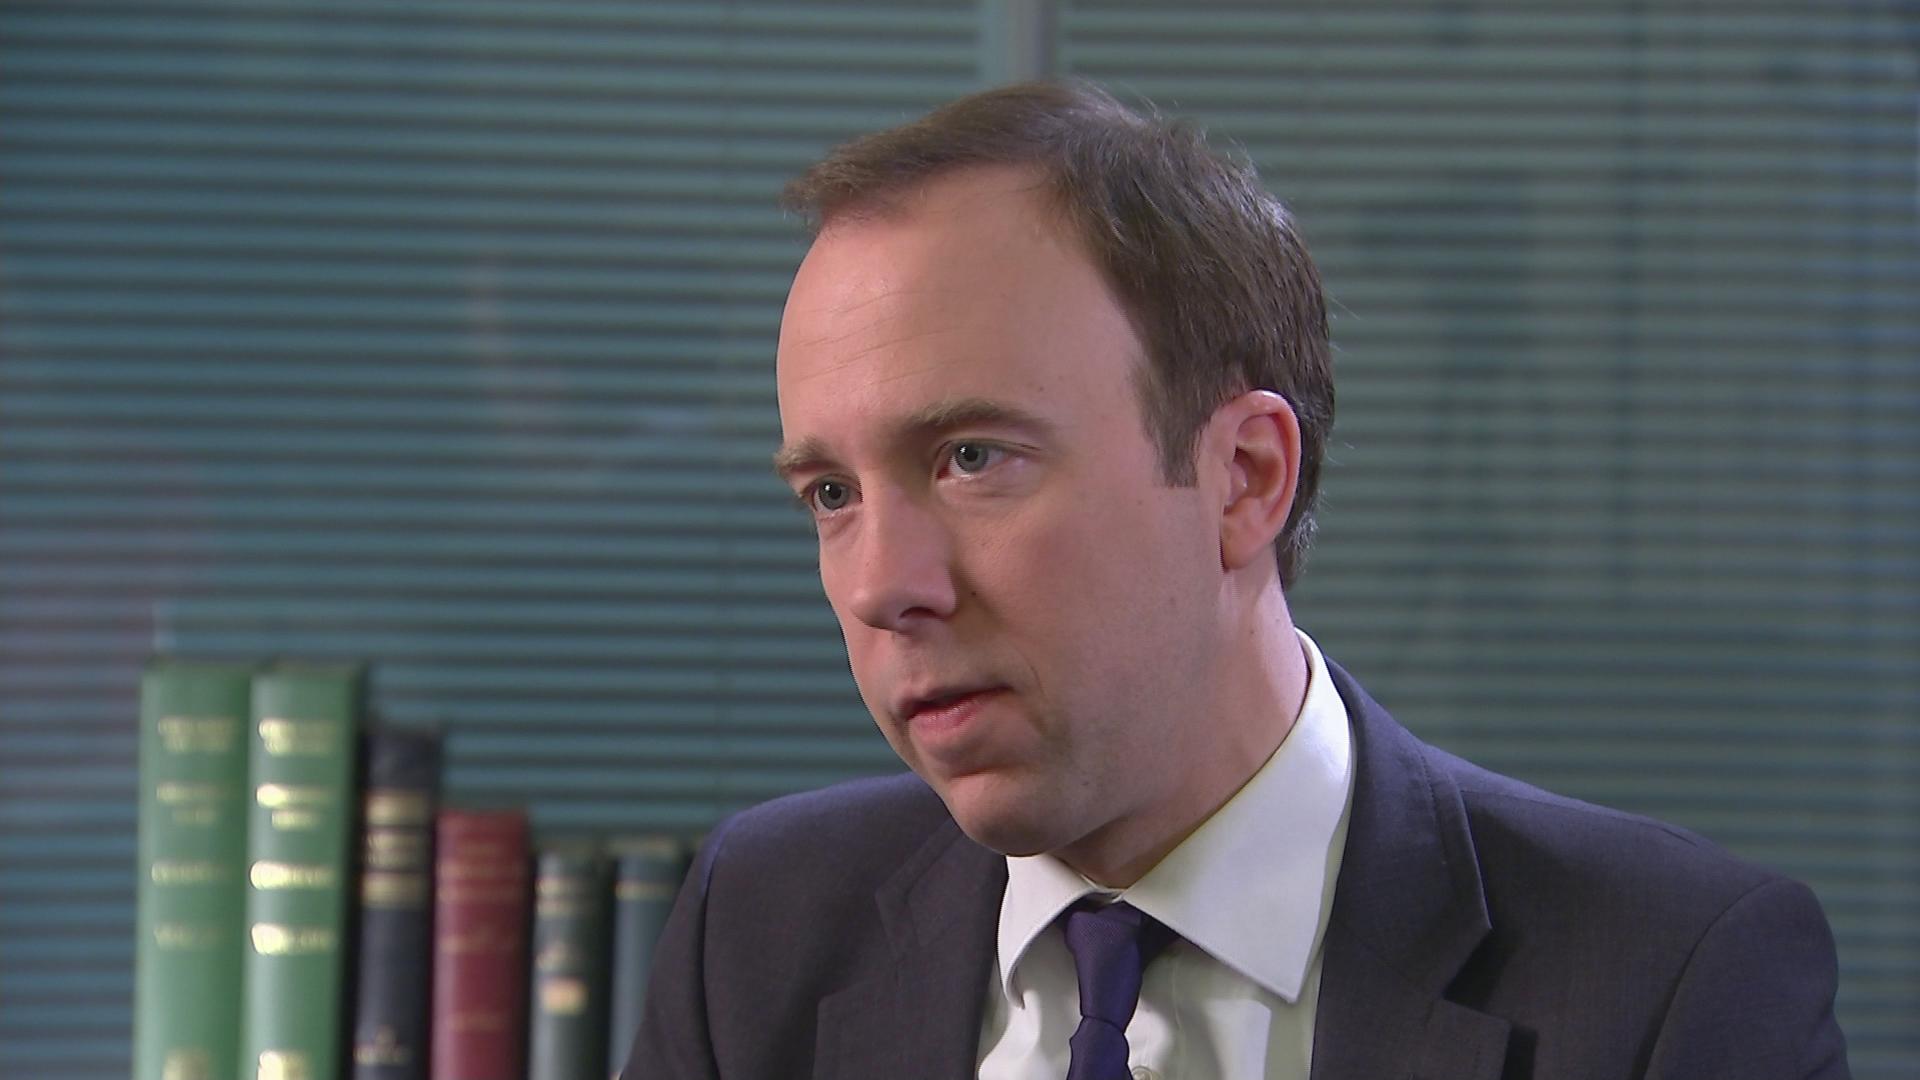 Politiker Matt Hancock aus UK